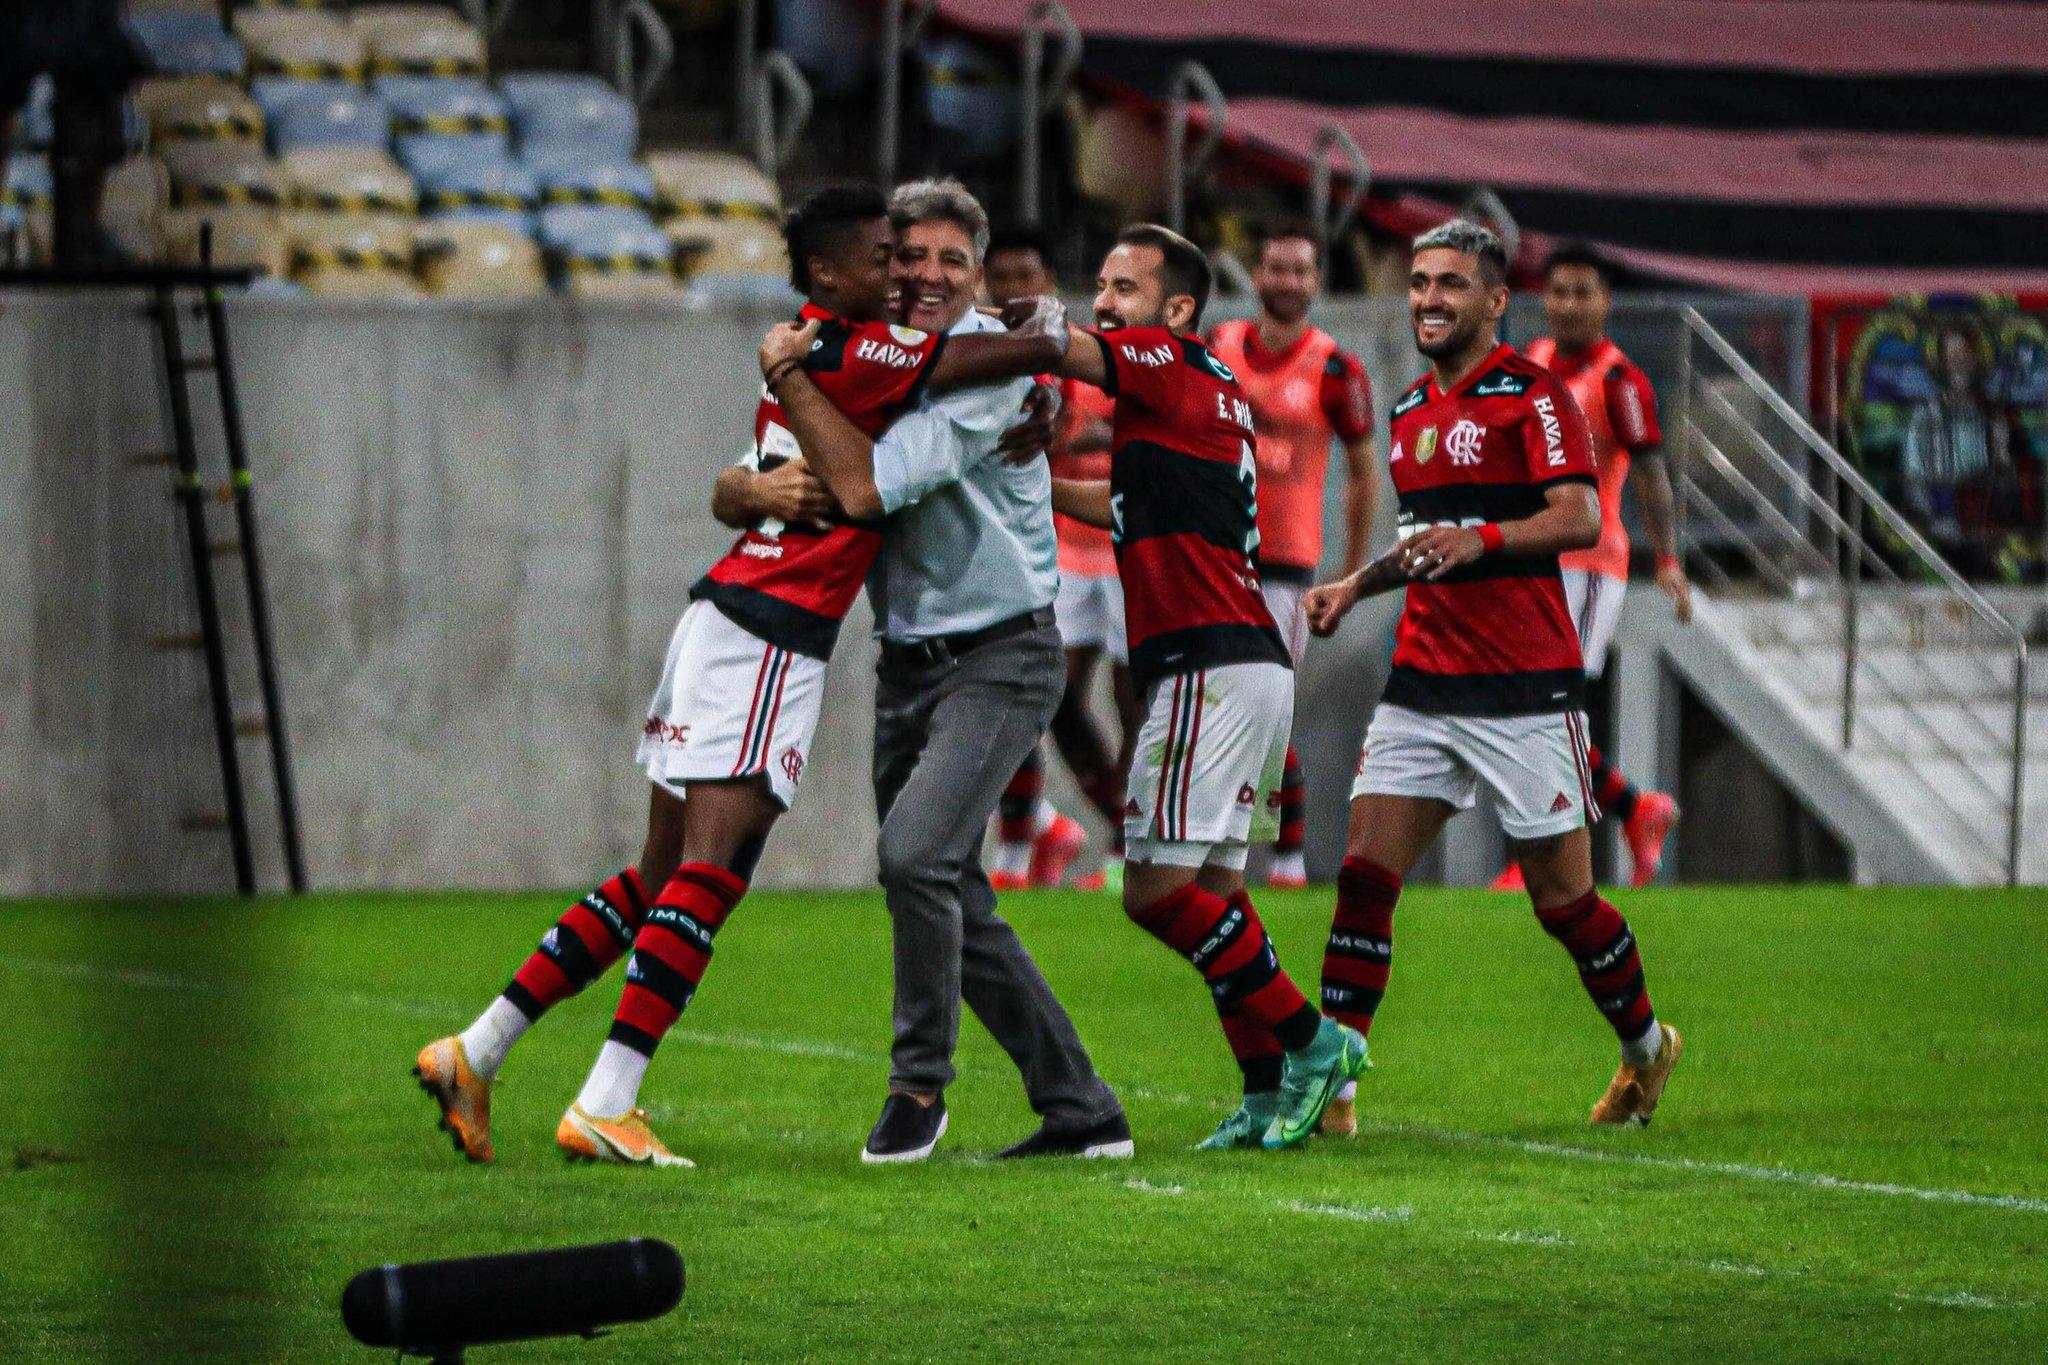 Avassalador, Renato resgata virtude do elenco para manter máximo aproveitamento no Flamengo